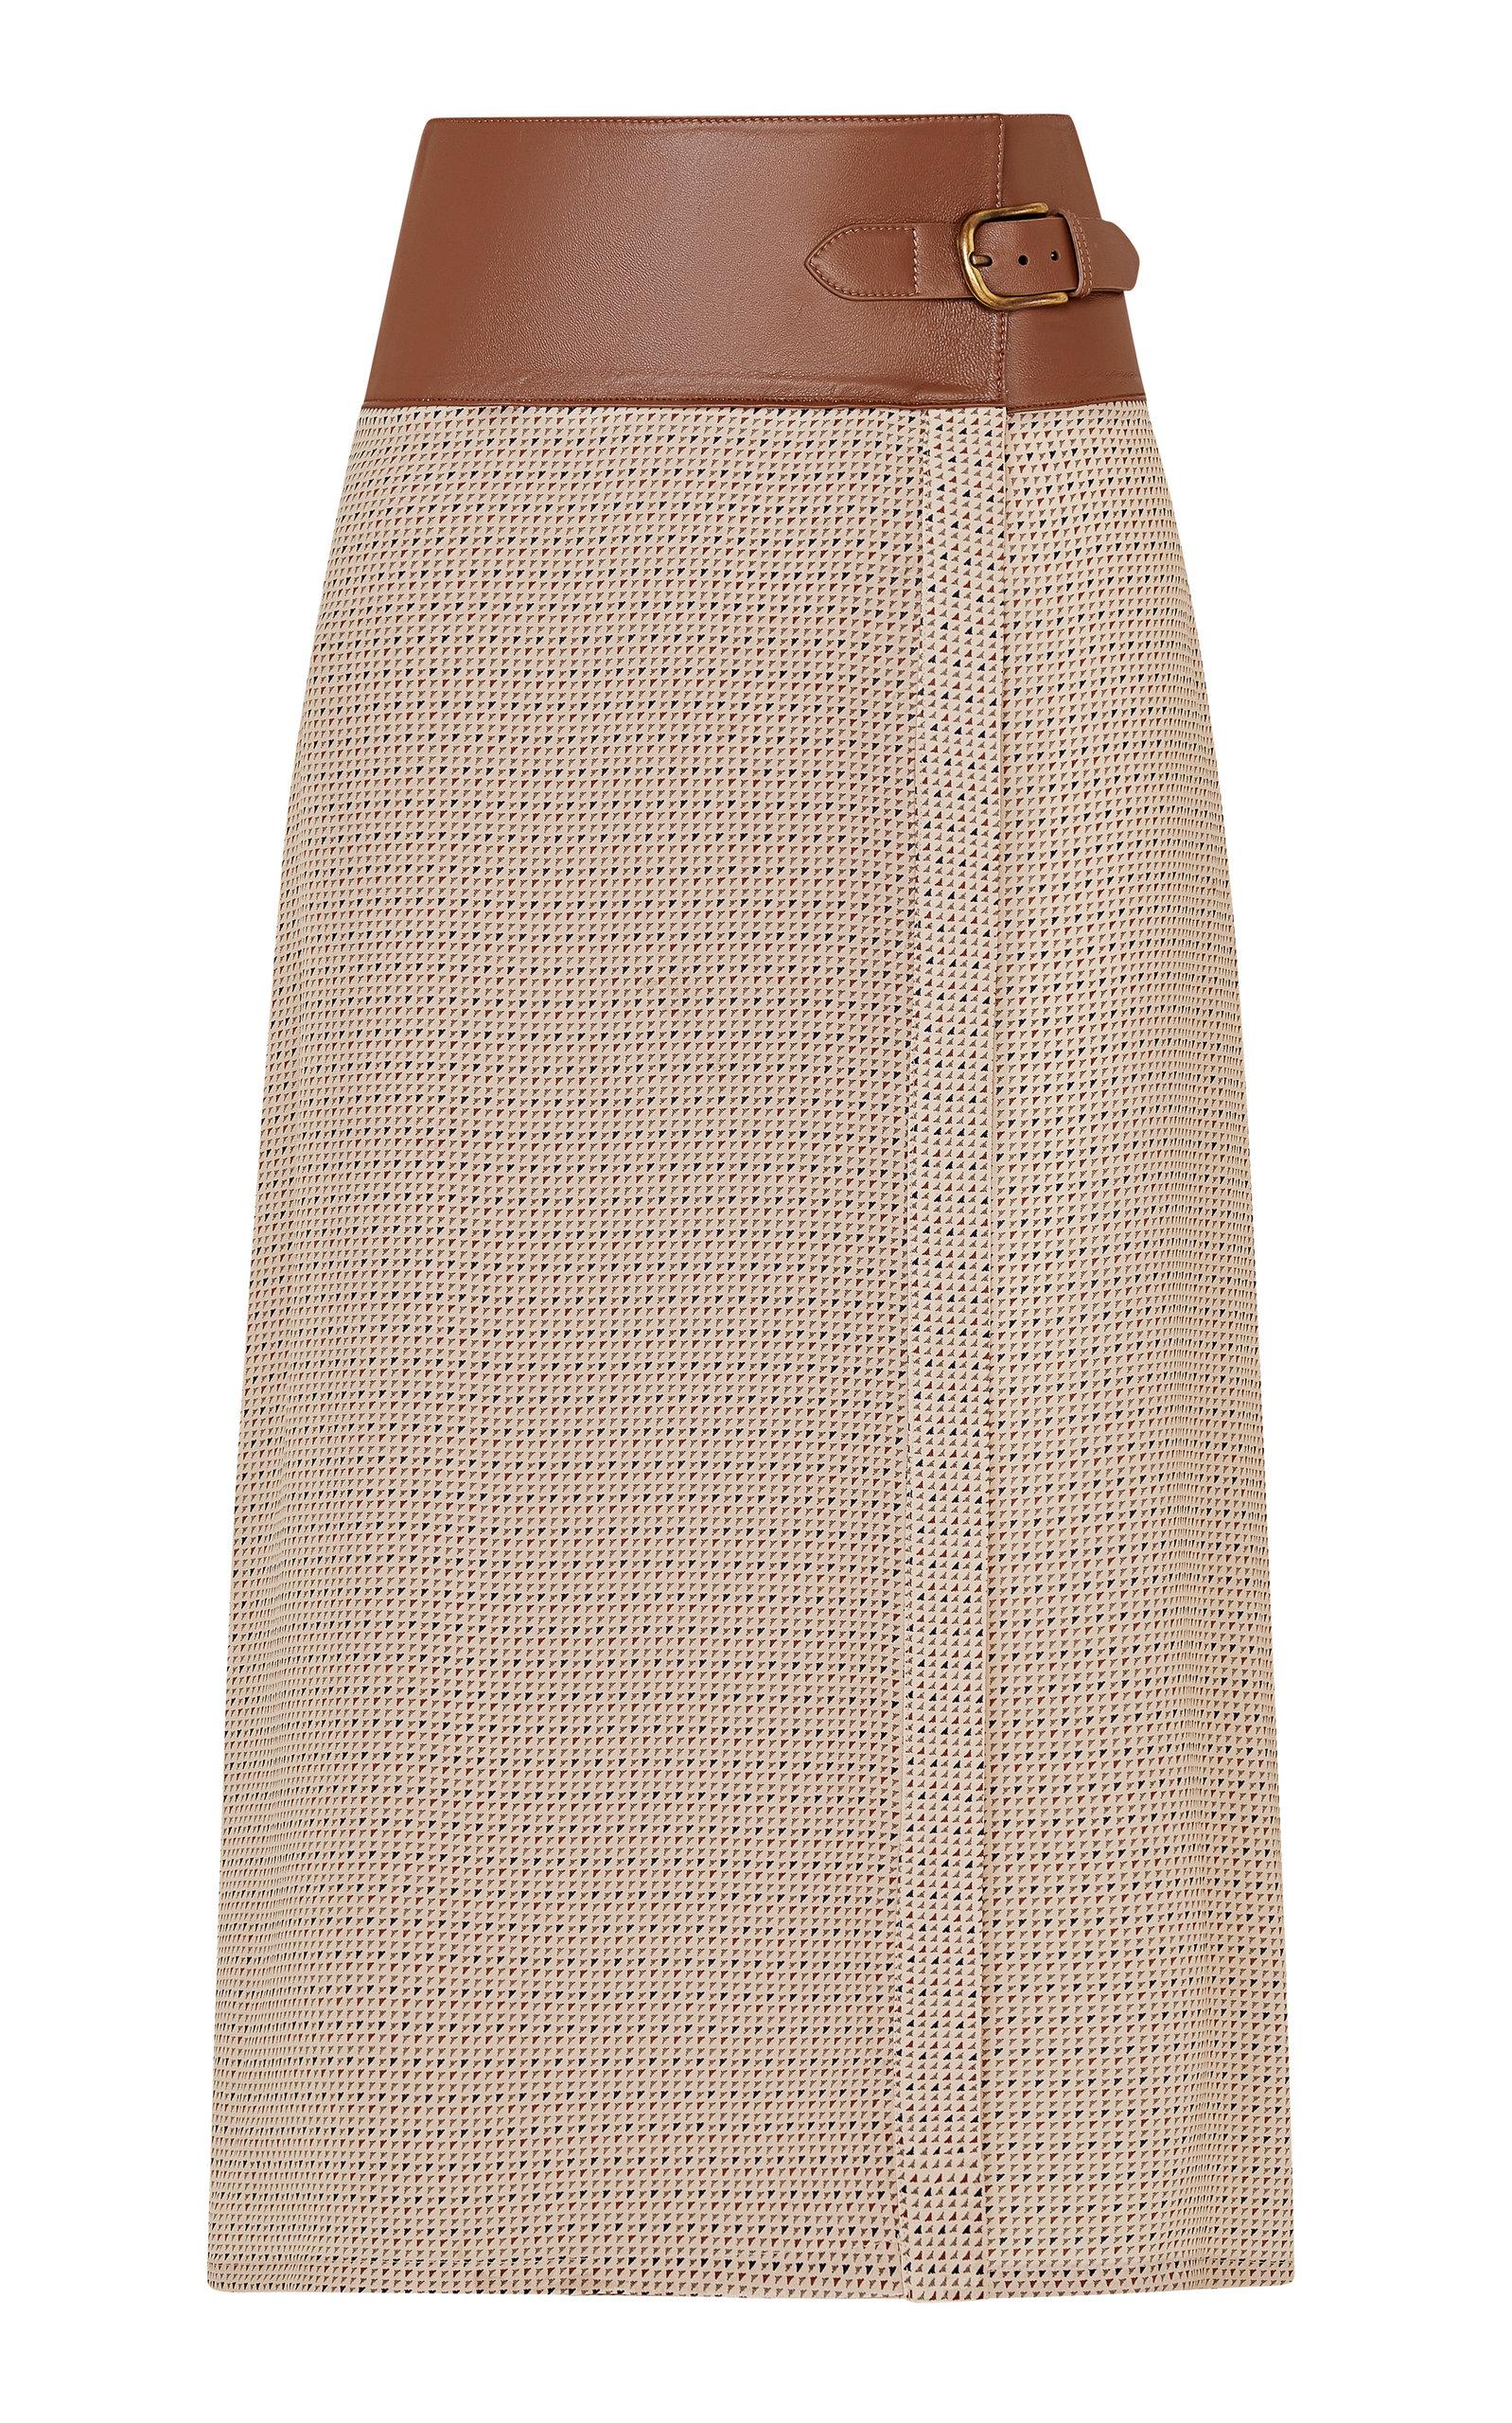 Women's The Alocasia Skirt